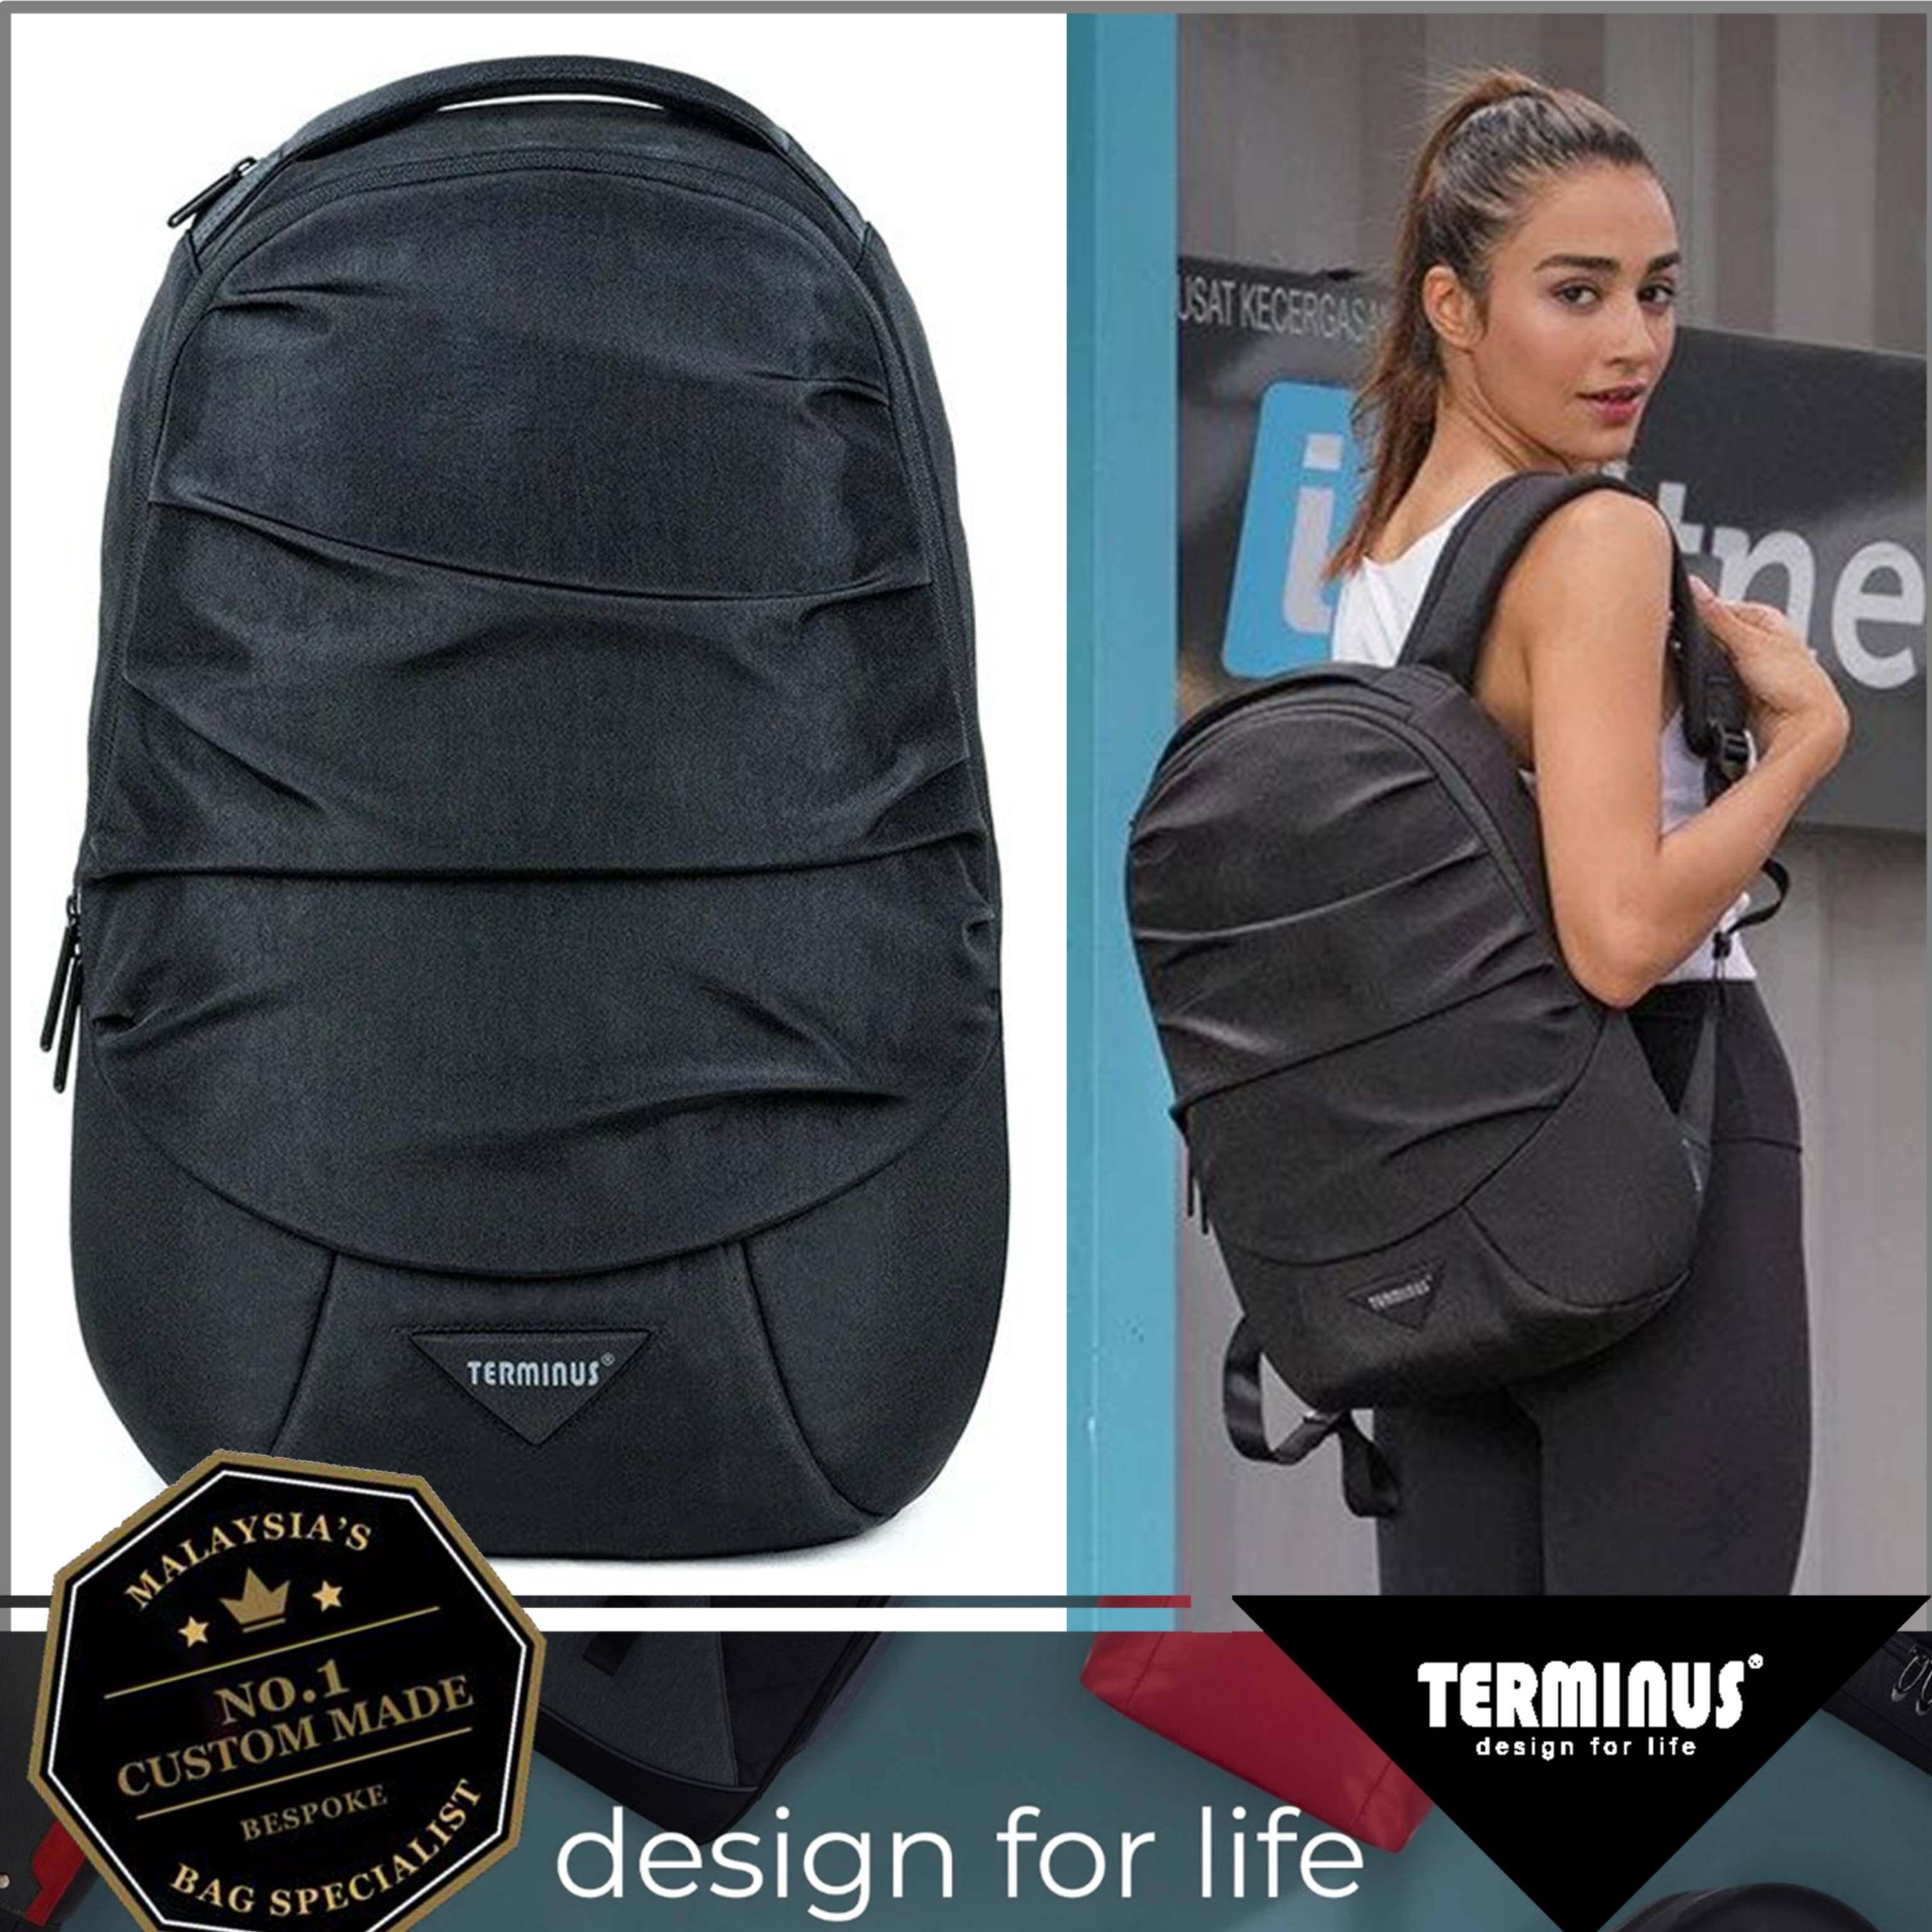 TERMINUS ® Wrinkle Ultra Light Anti Theft  Backpack Business Laptop Backpack Water Resistant Bookbag Travel College School Bookbag Computer Bag T02-690LAP-01